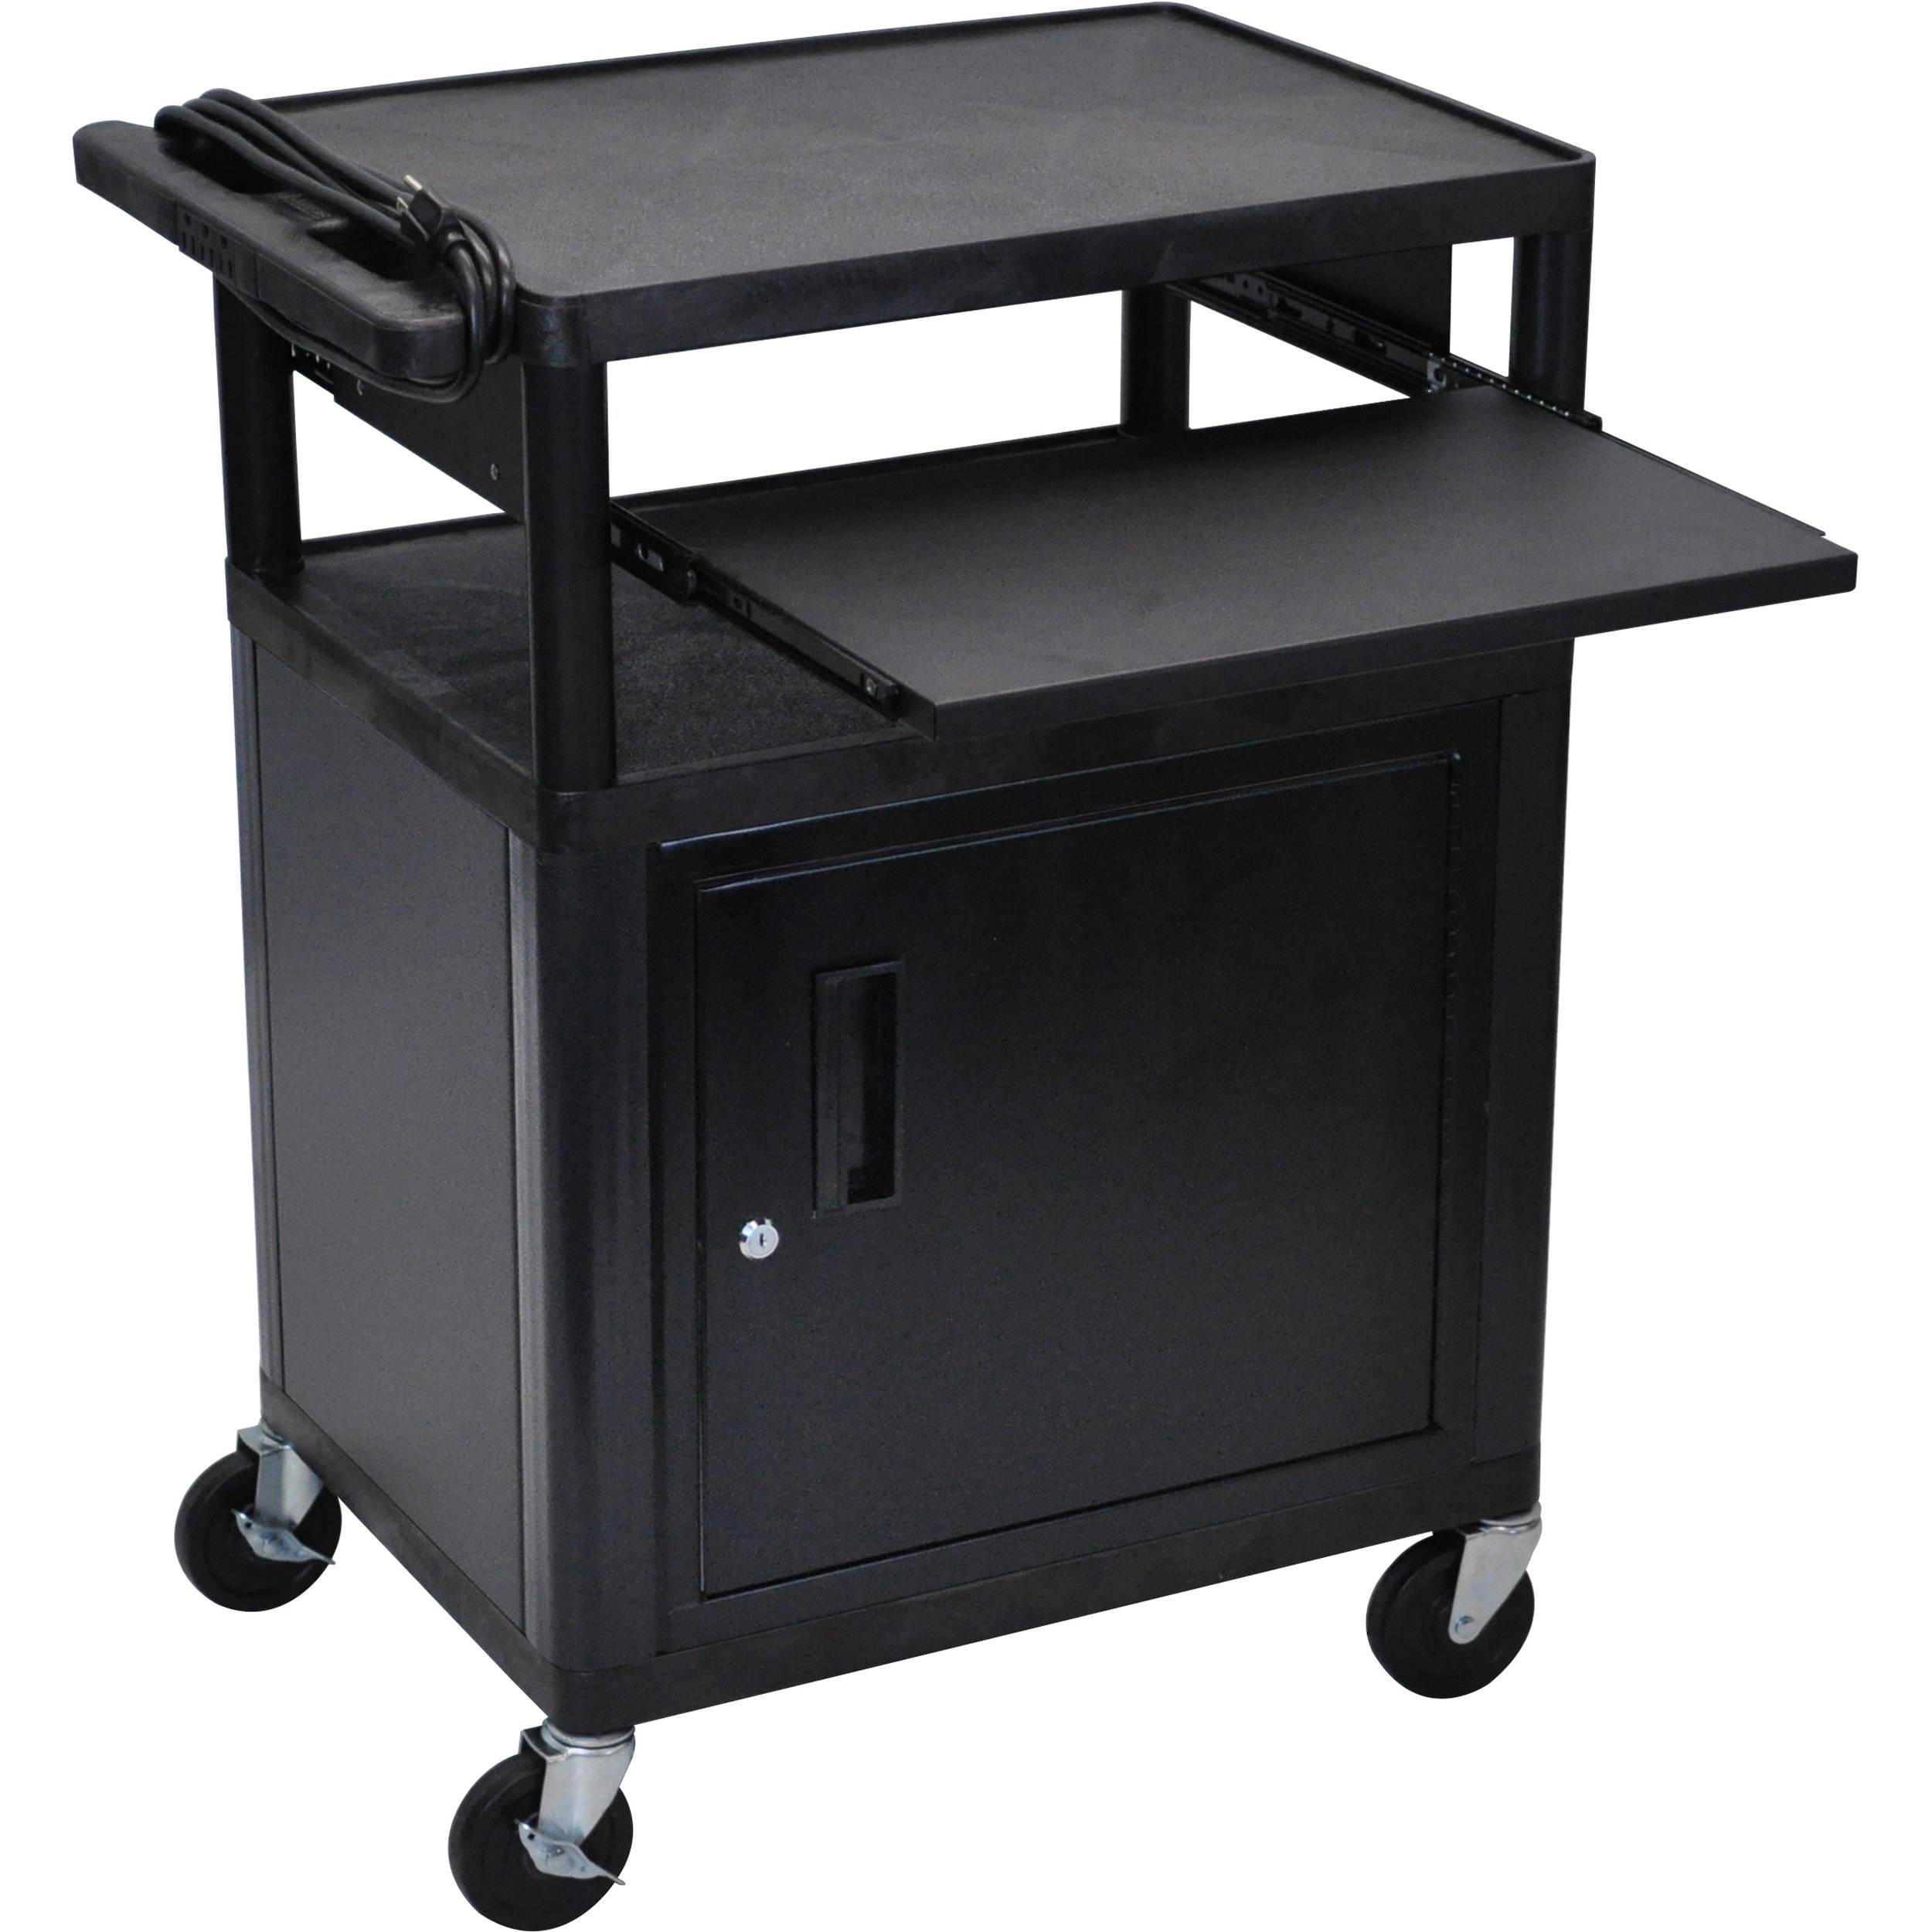 Luxor Kitchen Cabinets: Luxor LP34CLE-B Presentation Cart With Locking Cabinet